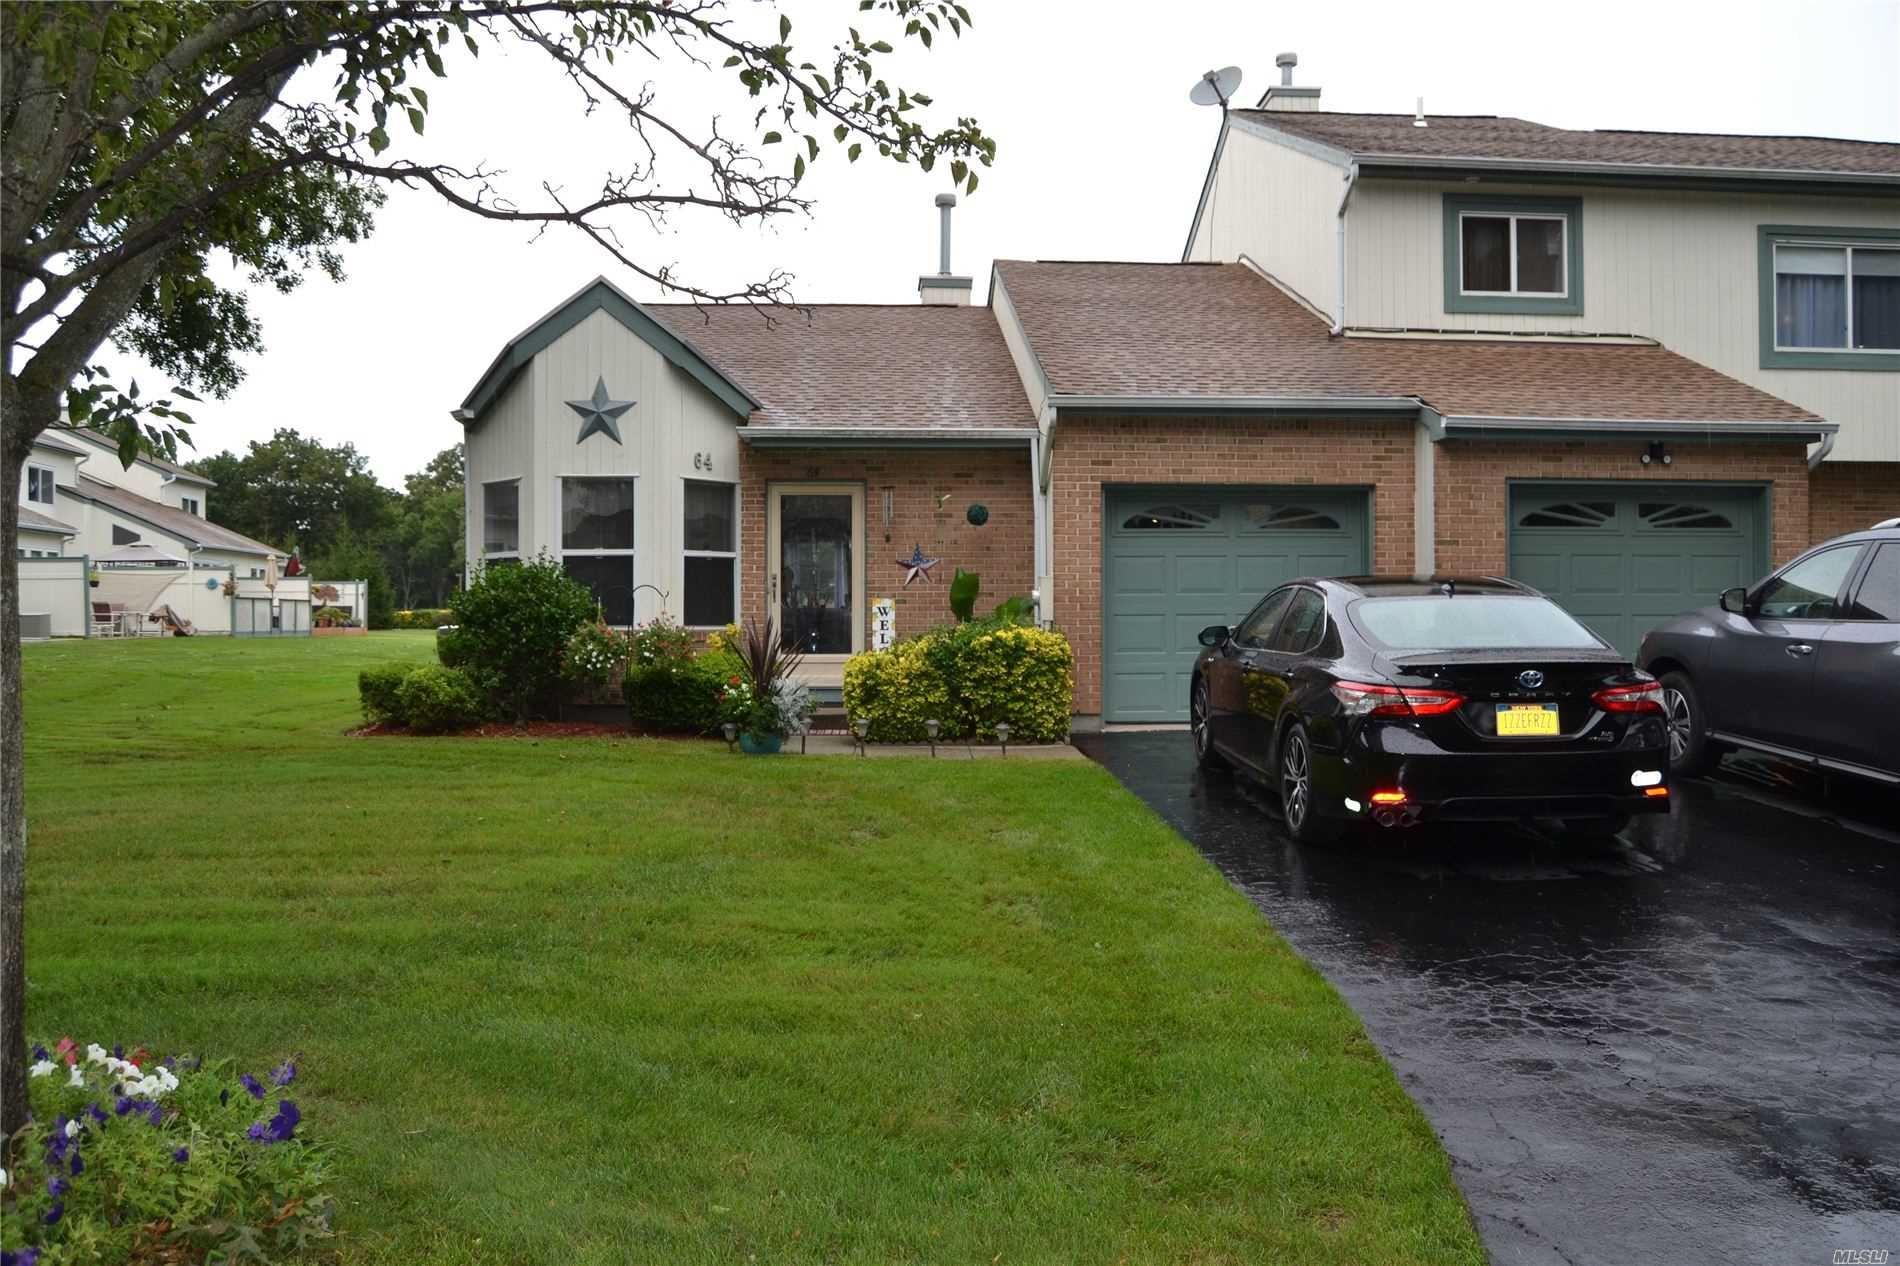 64 Timber Ridge Drive, Holtsville, NY 11742 - MLS#: 3240478